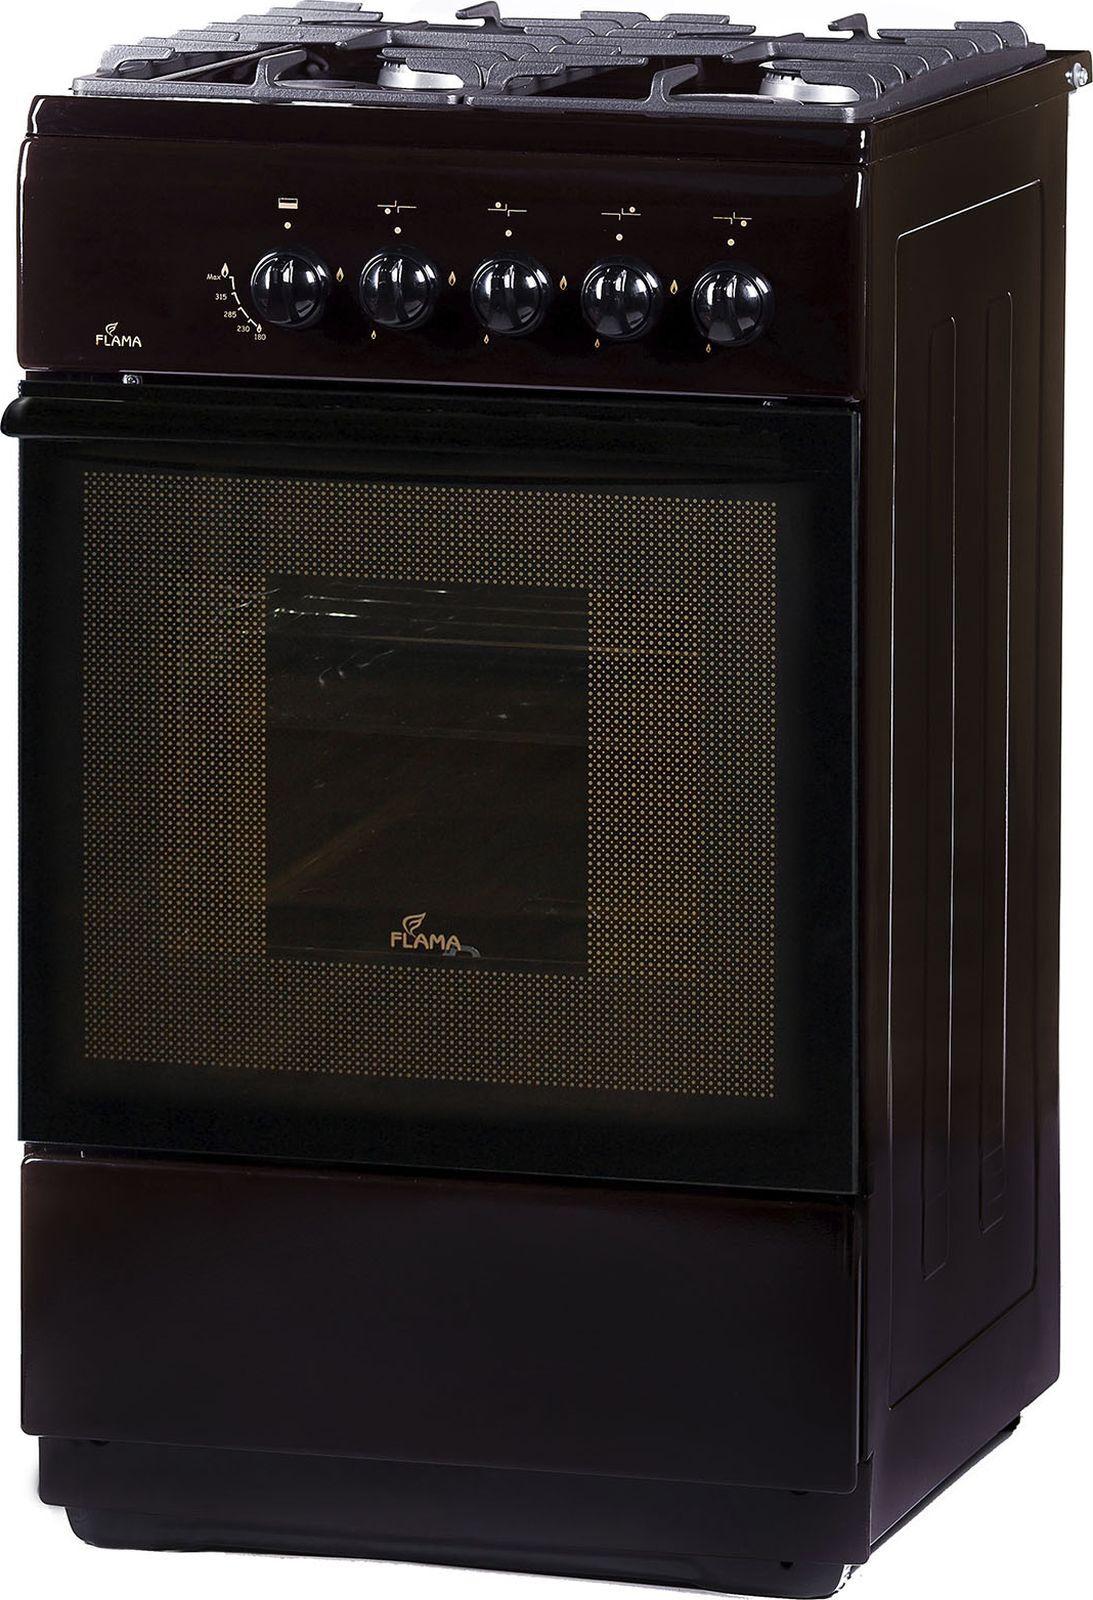 Кухонная плита Flama FG 24028 B, коричневый